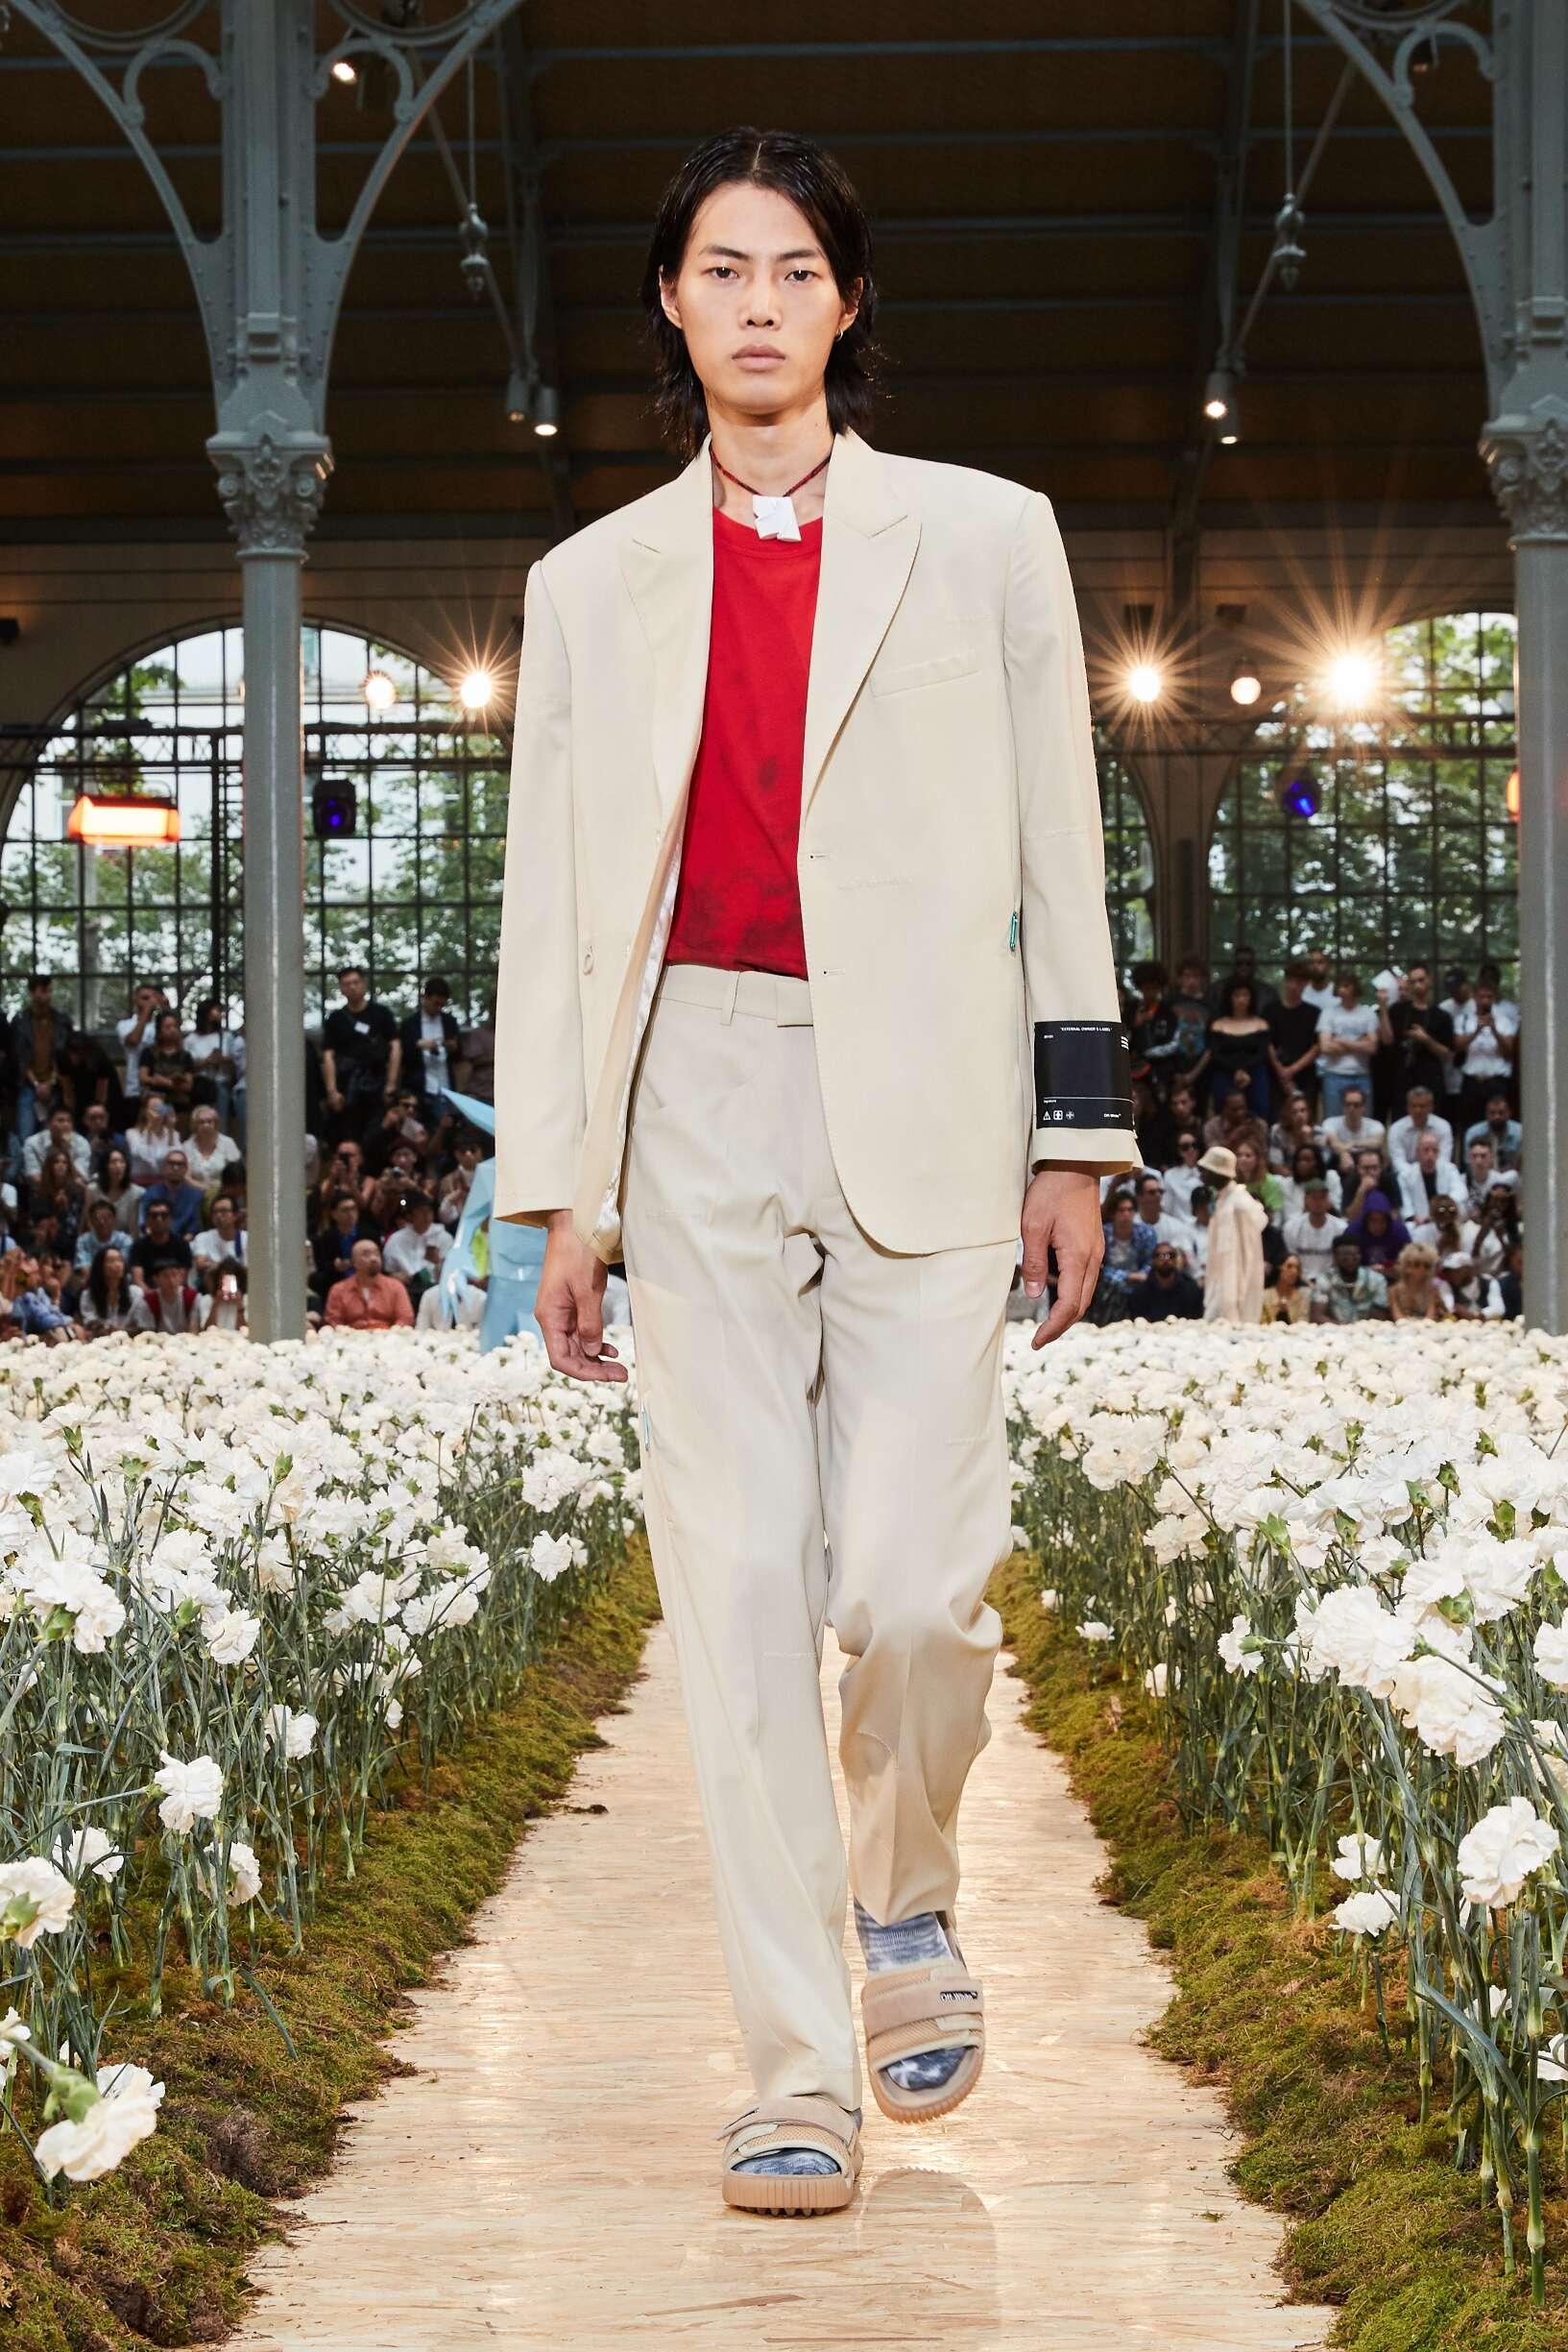 Catwalk Off White c/o Virgil Abloh Man Fashion Show Summer 2020